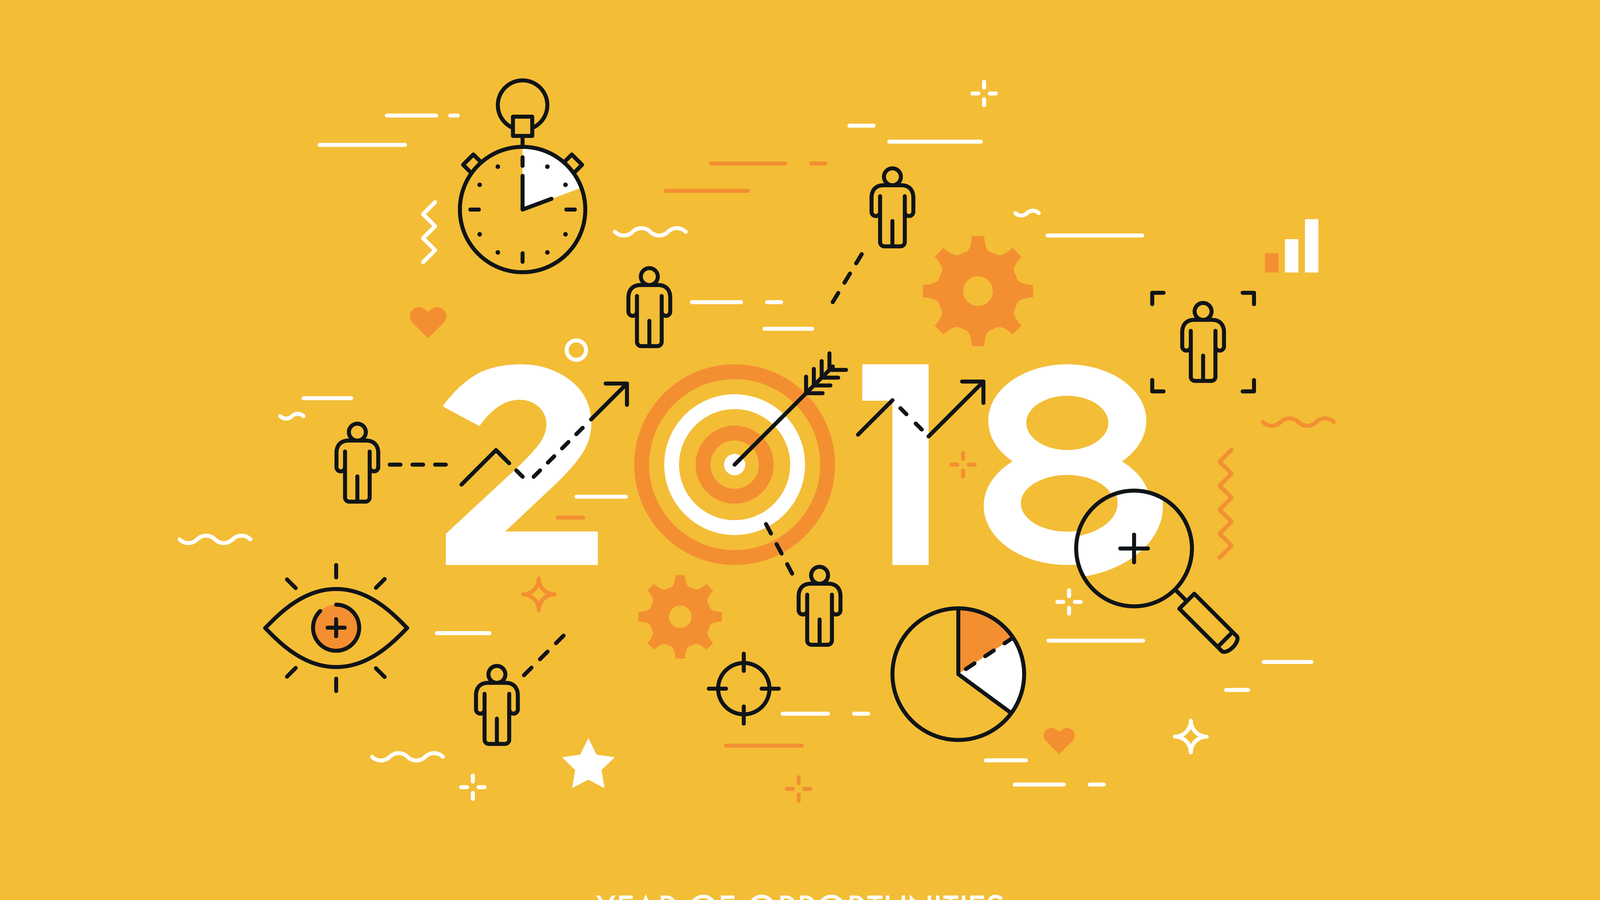 7 Digital Marketing Predictions for 2018